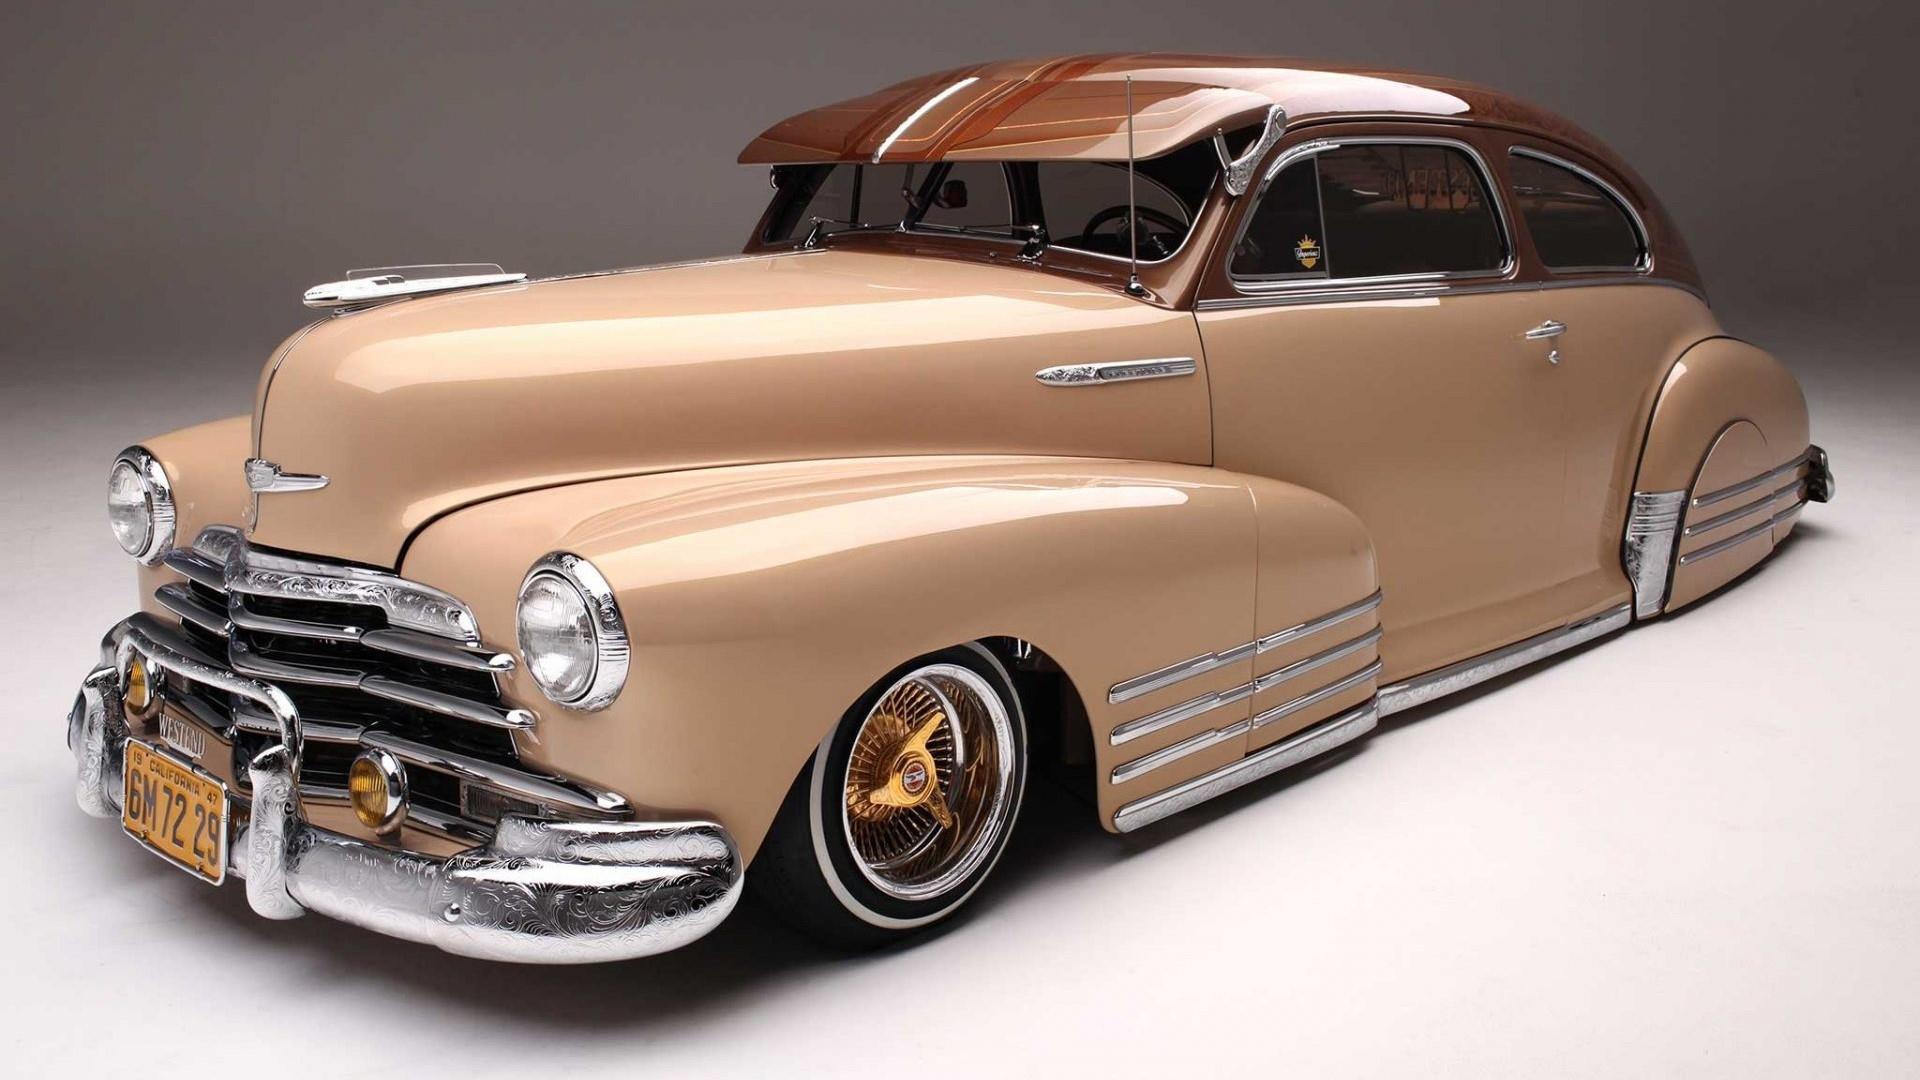 1947 Chevrolet Fleetline wallpaper